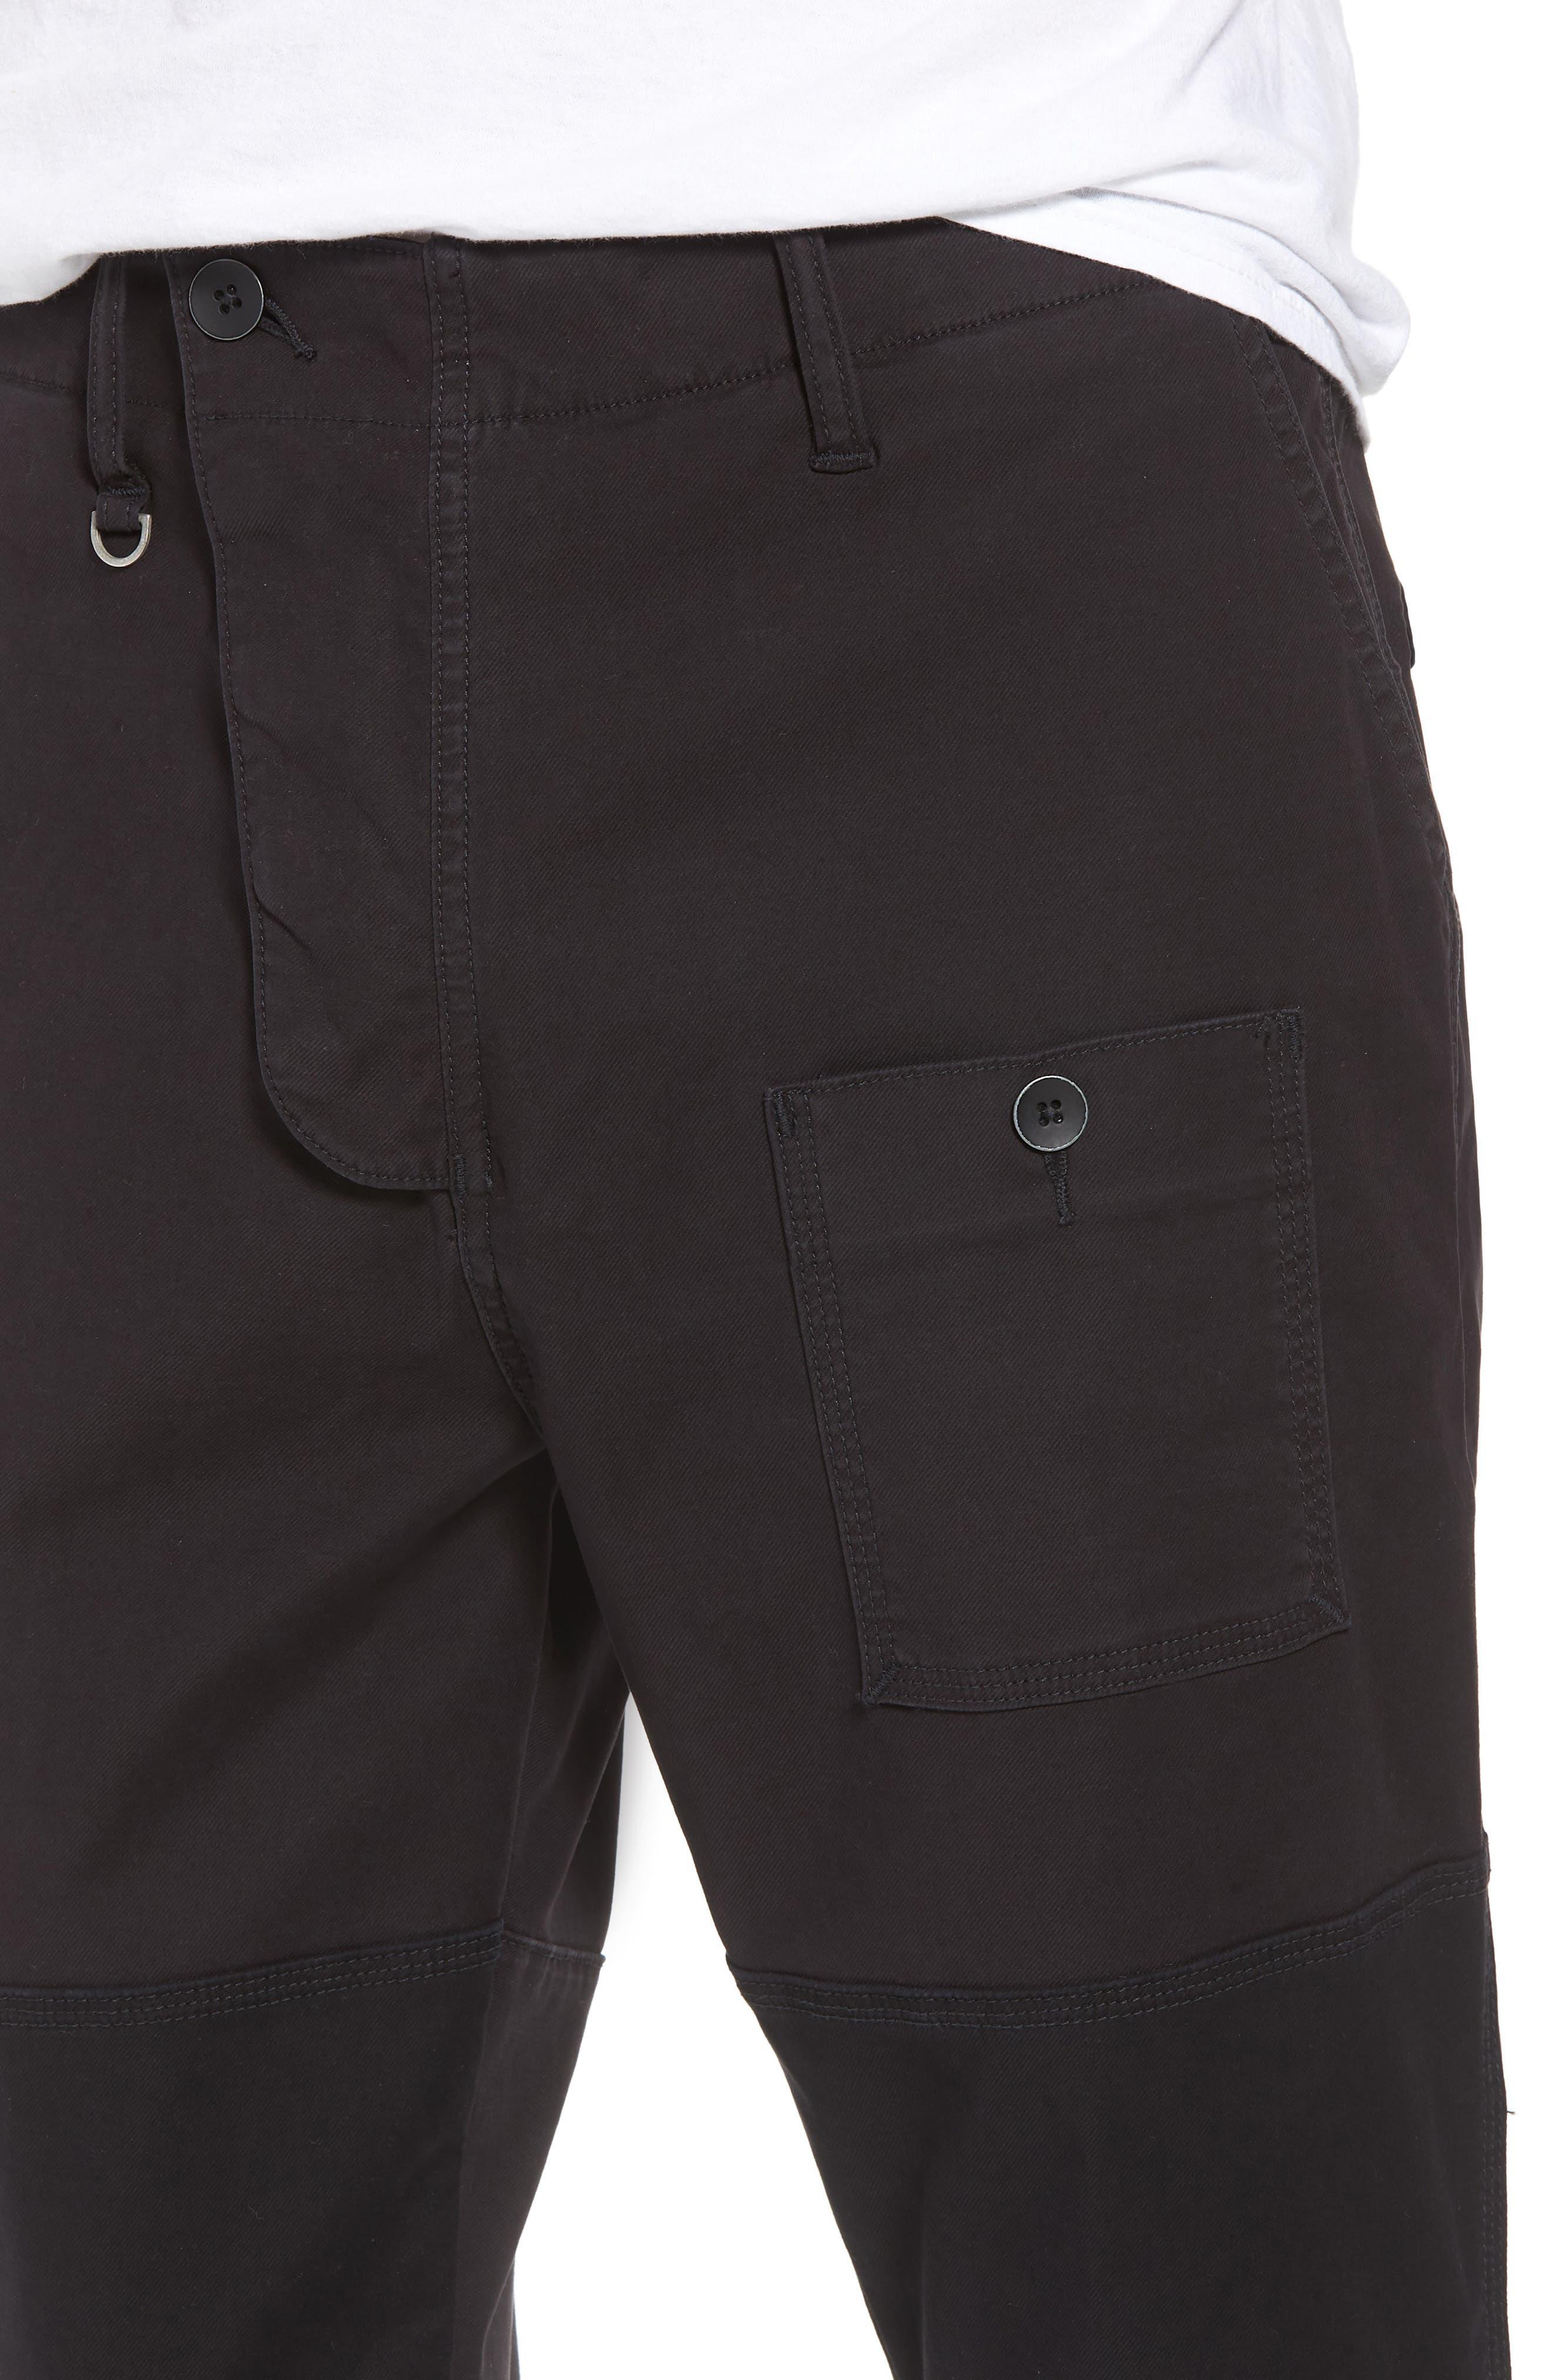 HUDSON JEANS,                             Slouchy Slim Fit Cargo Pants,                             Alternate thumbnail 4, color,                             001